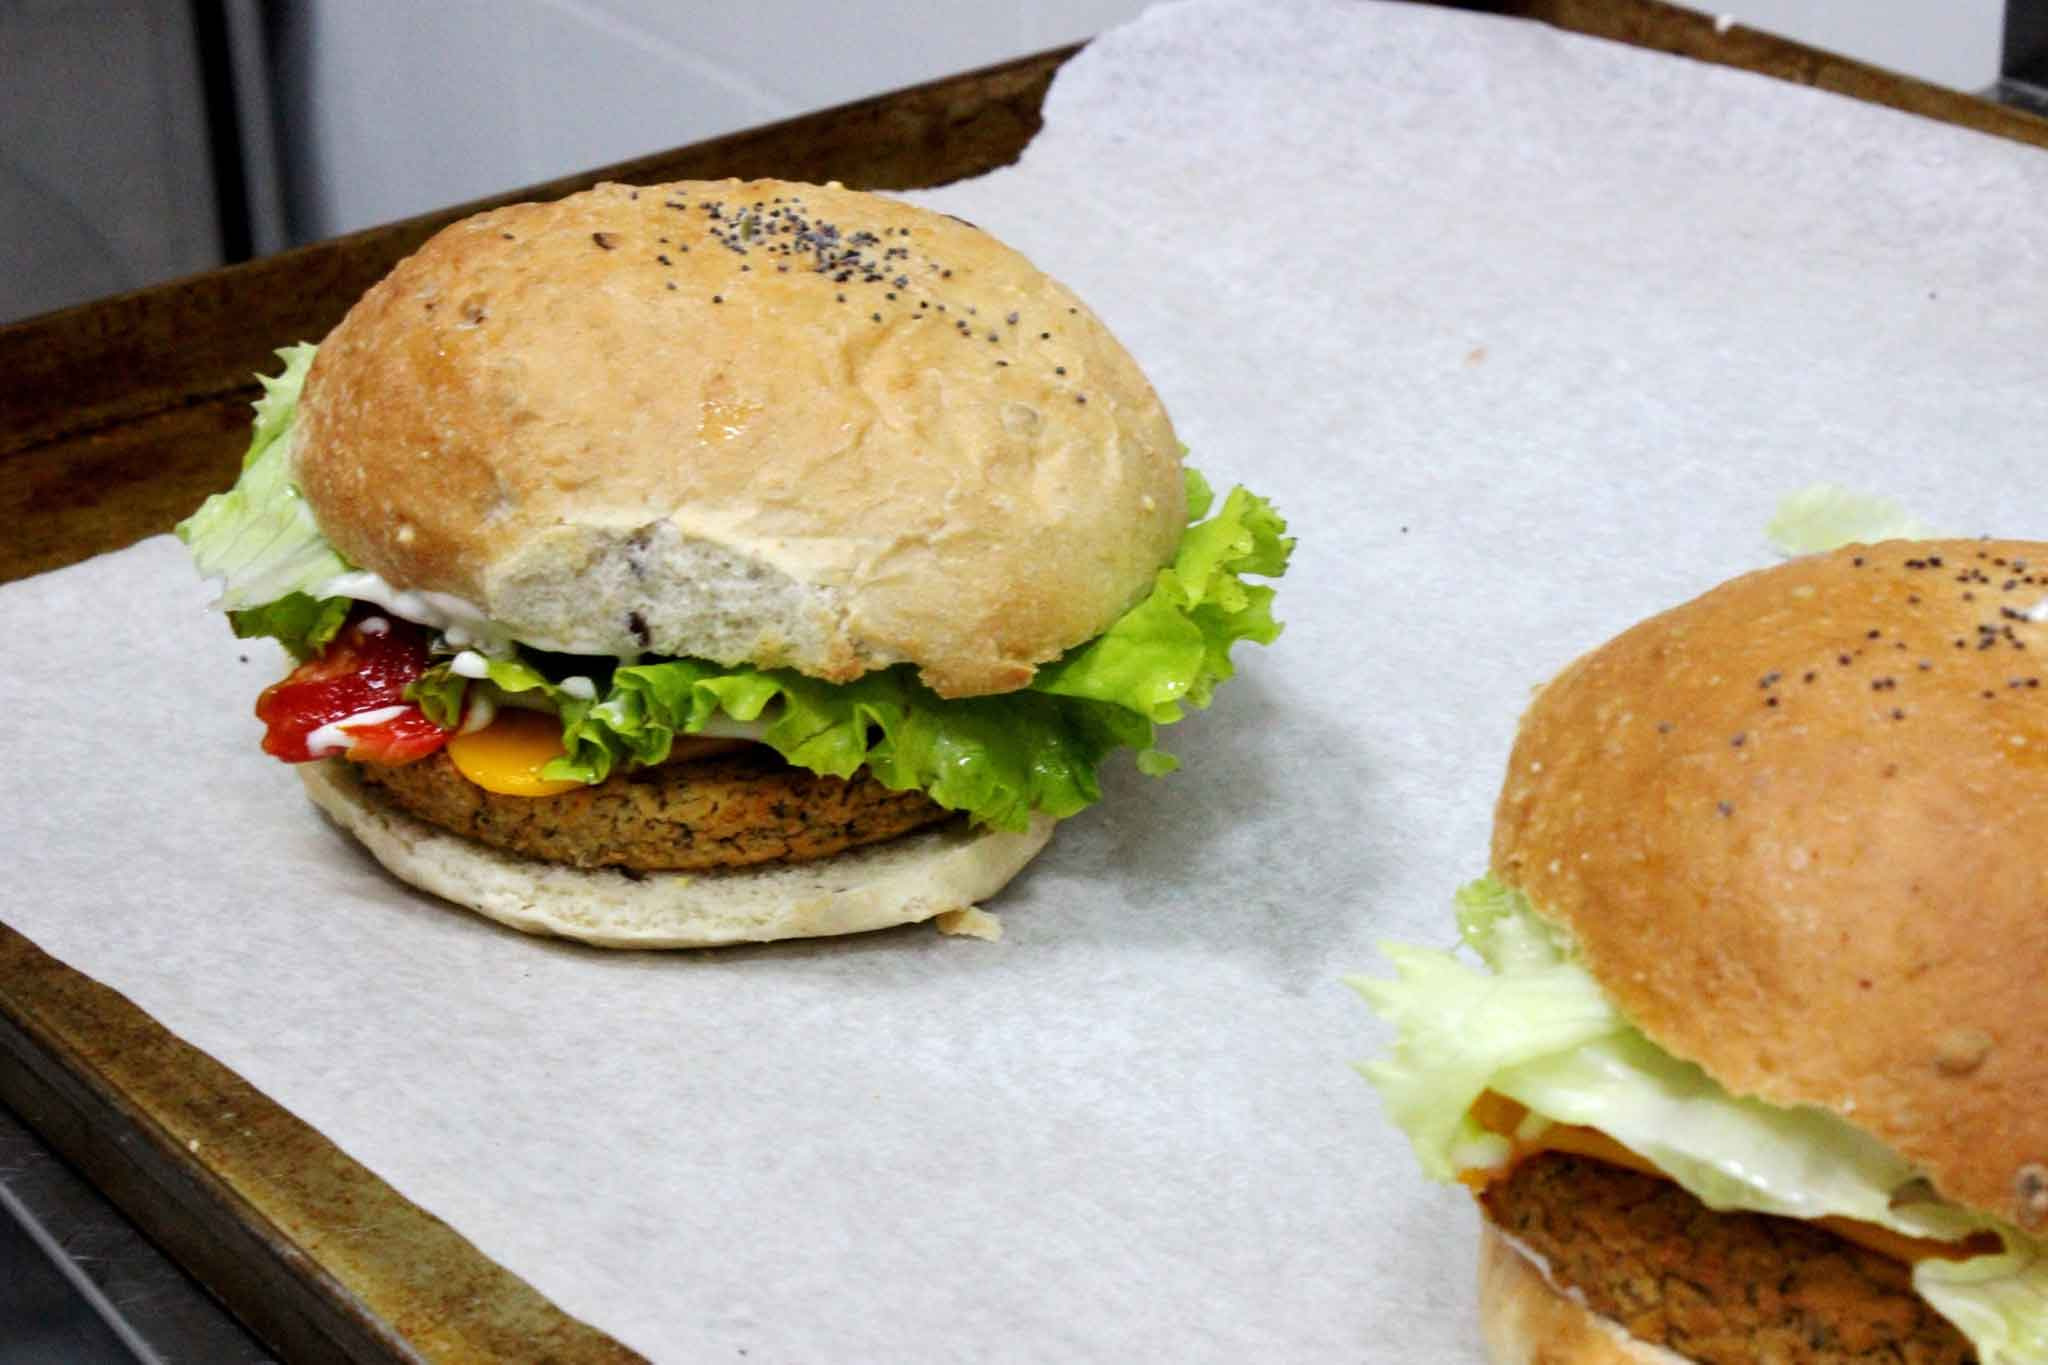 flower-burger-cecio-classic